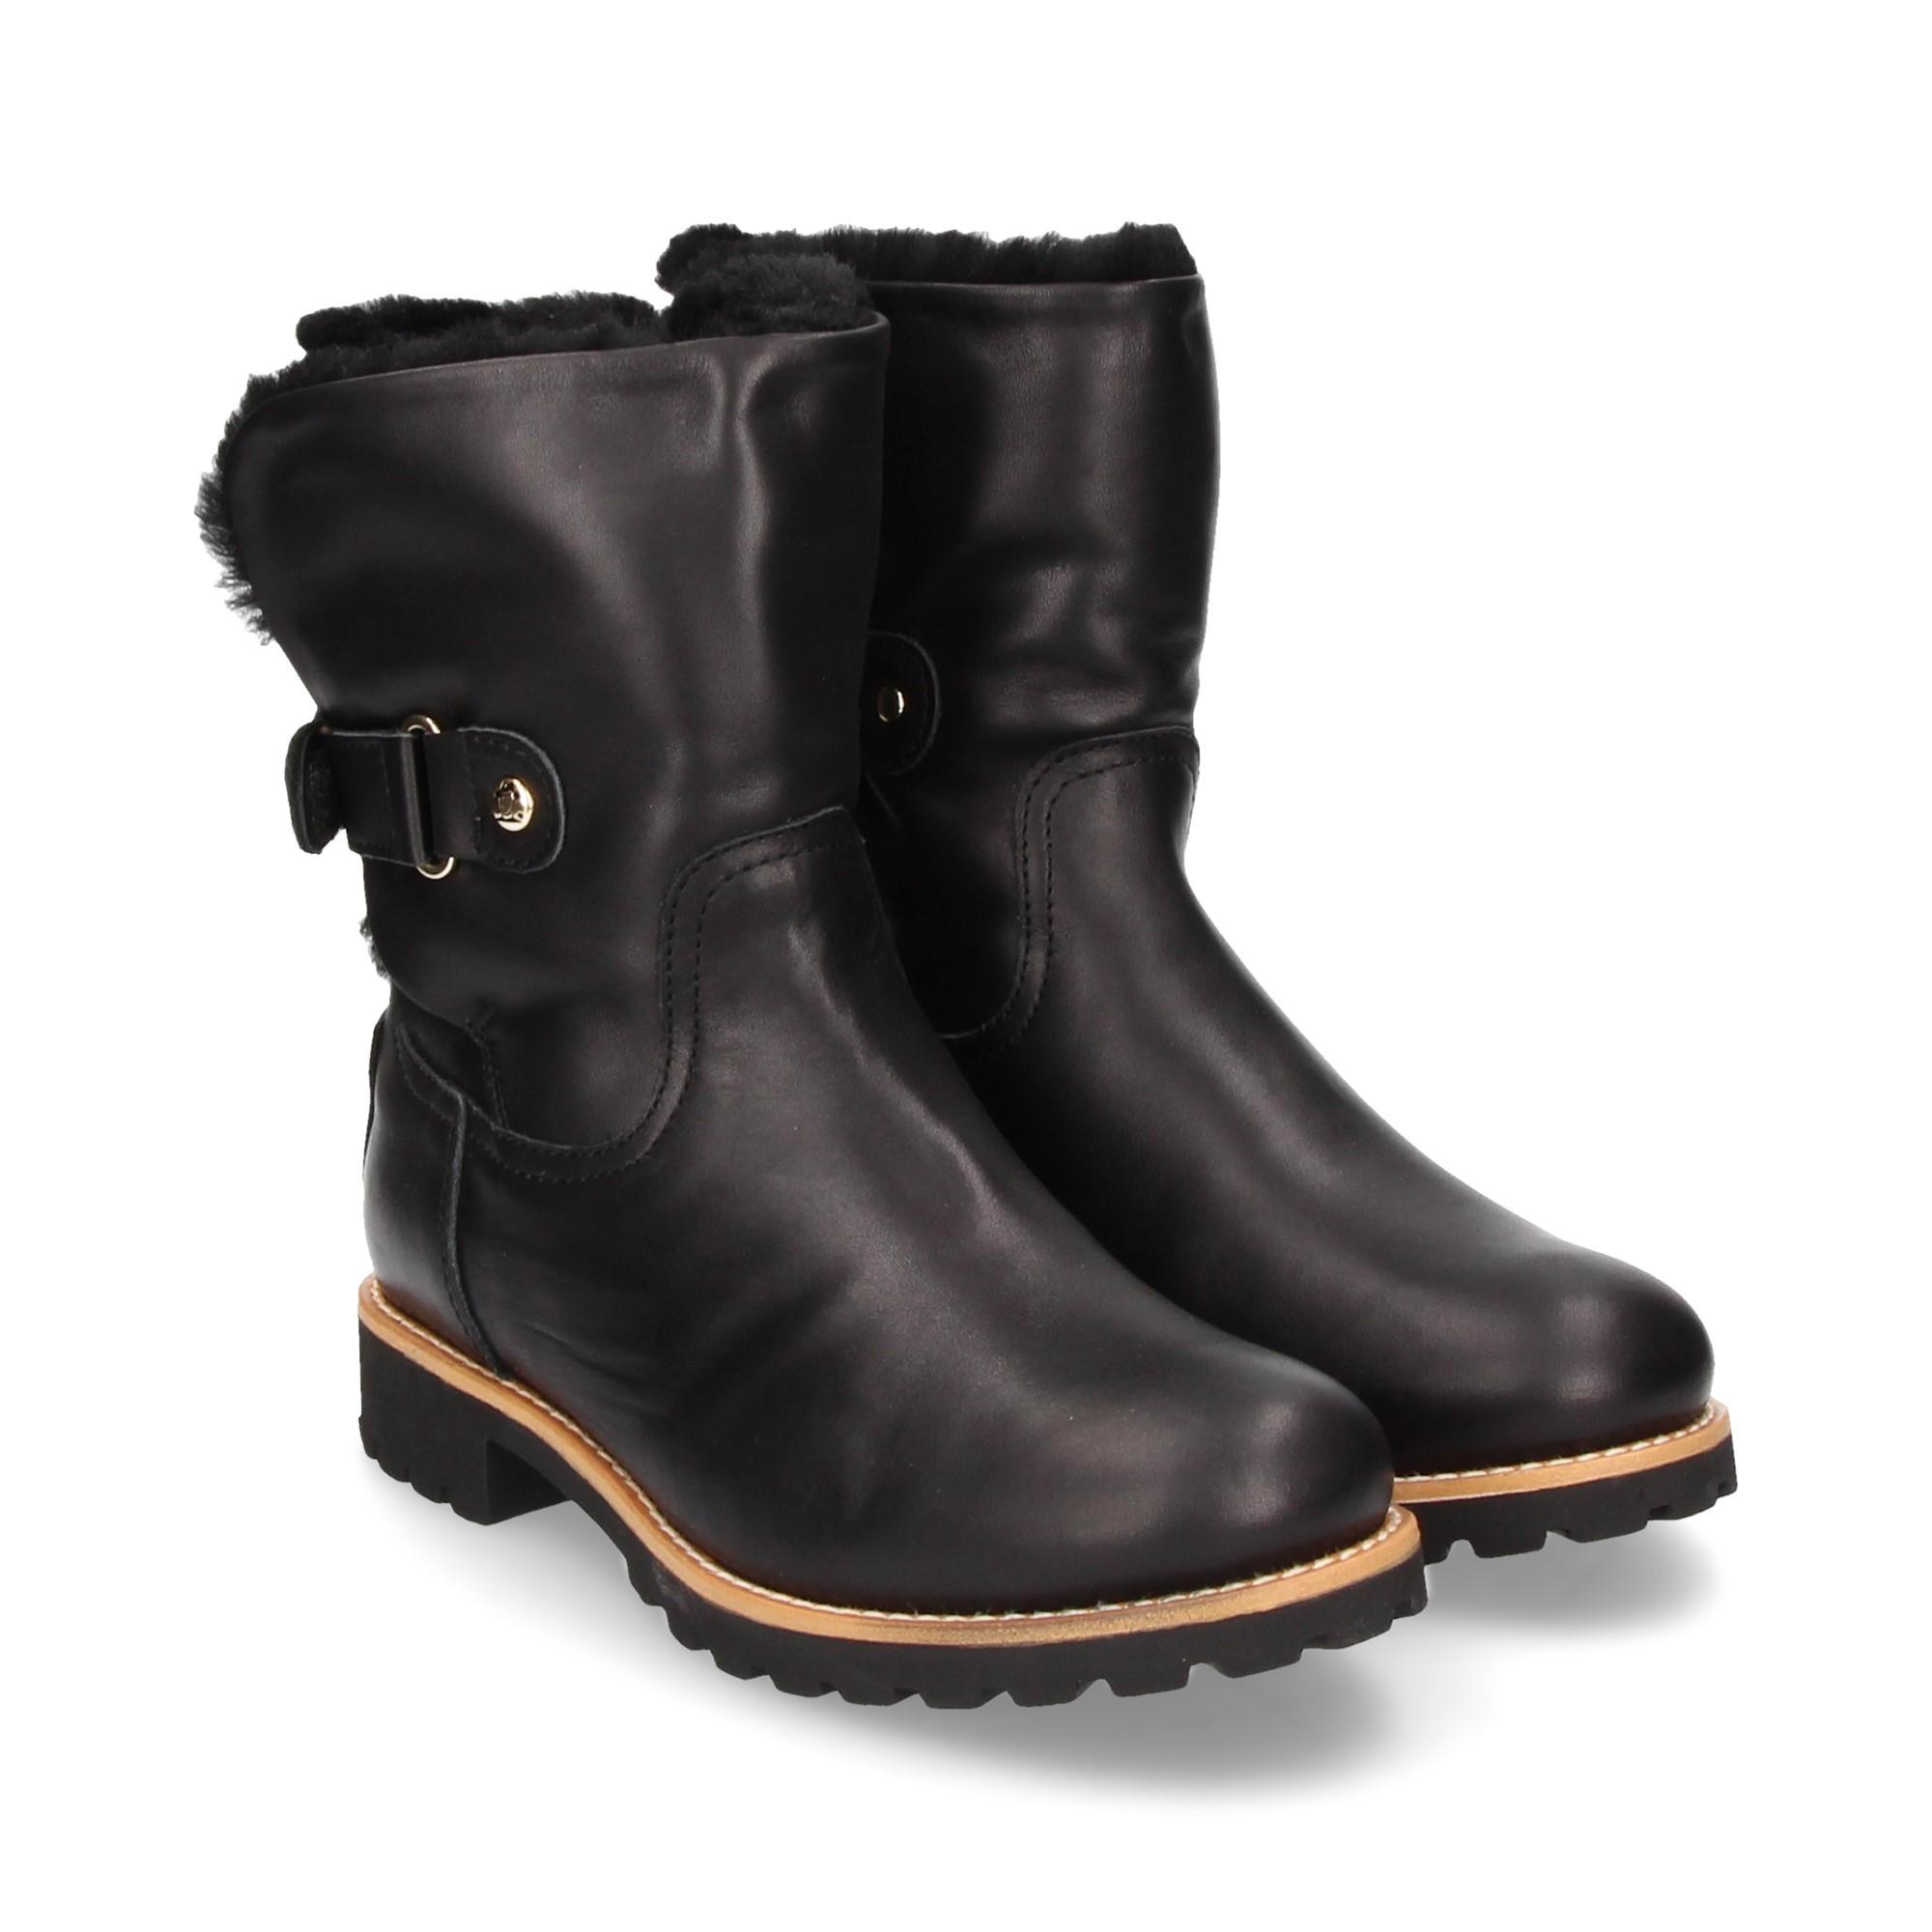 5807d4f8e97 PANAMA JACK Women s flat ankle boots FELIA IGLOO B2 NEGRO